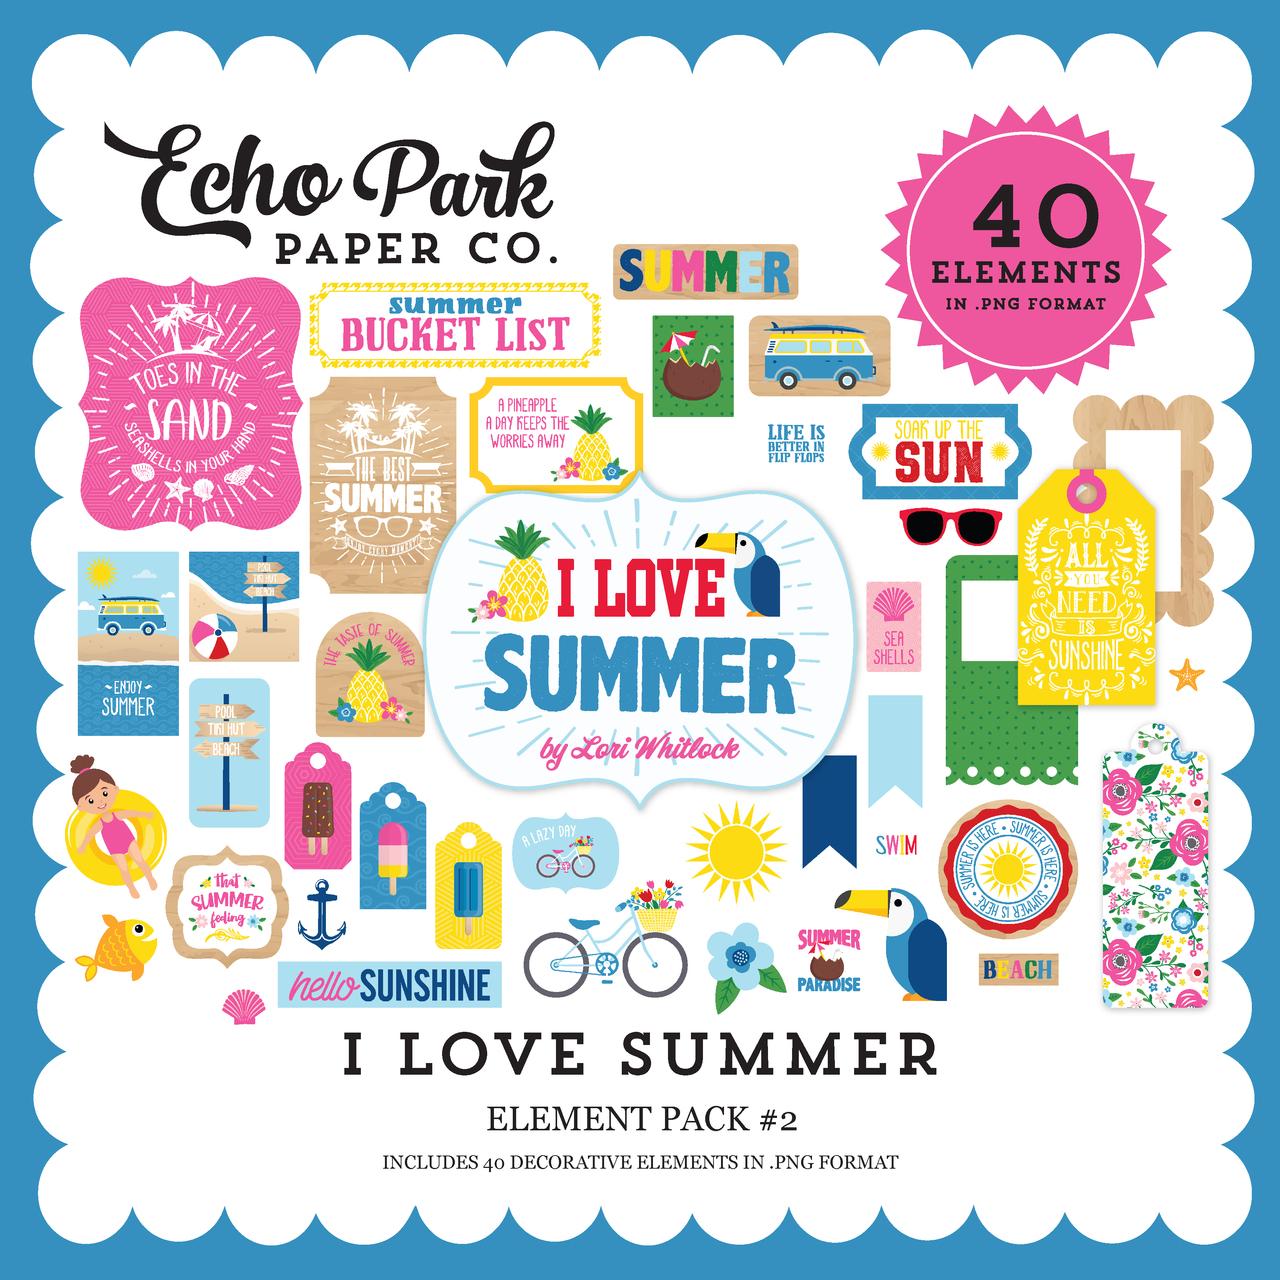 I Love Summer Element Pack #2